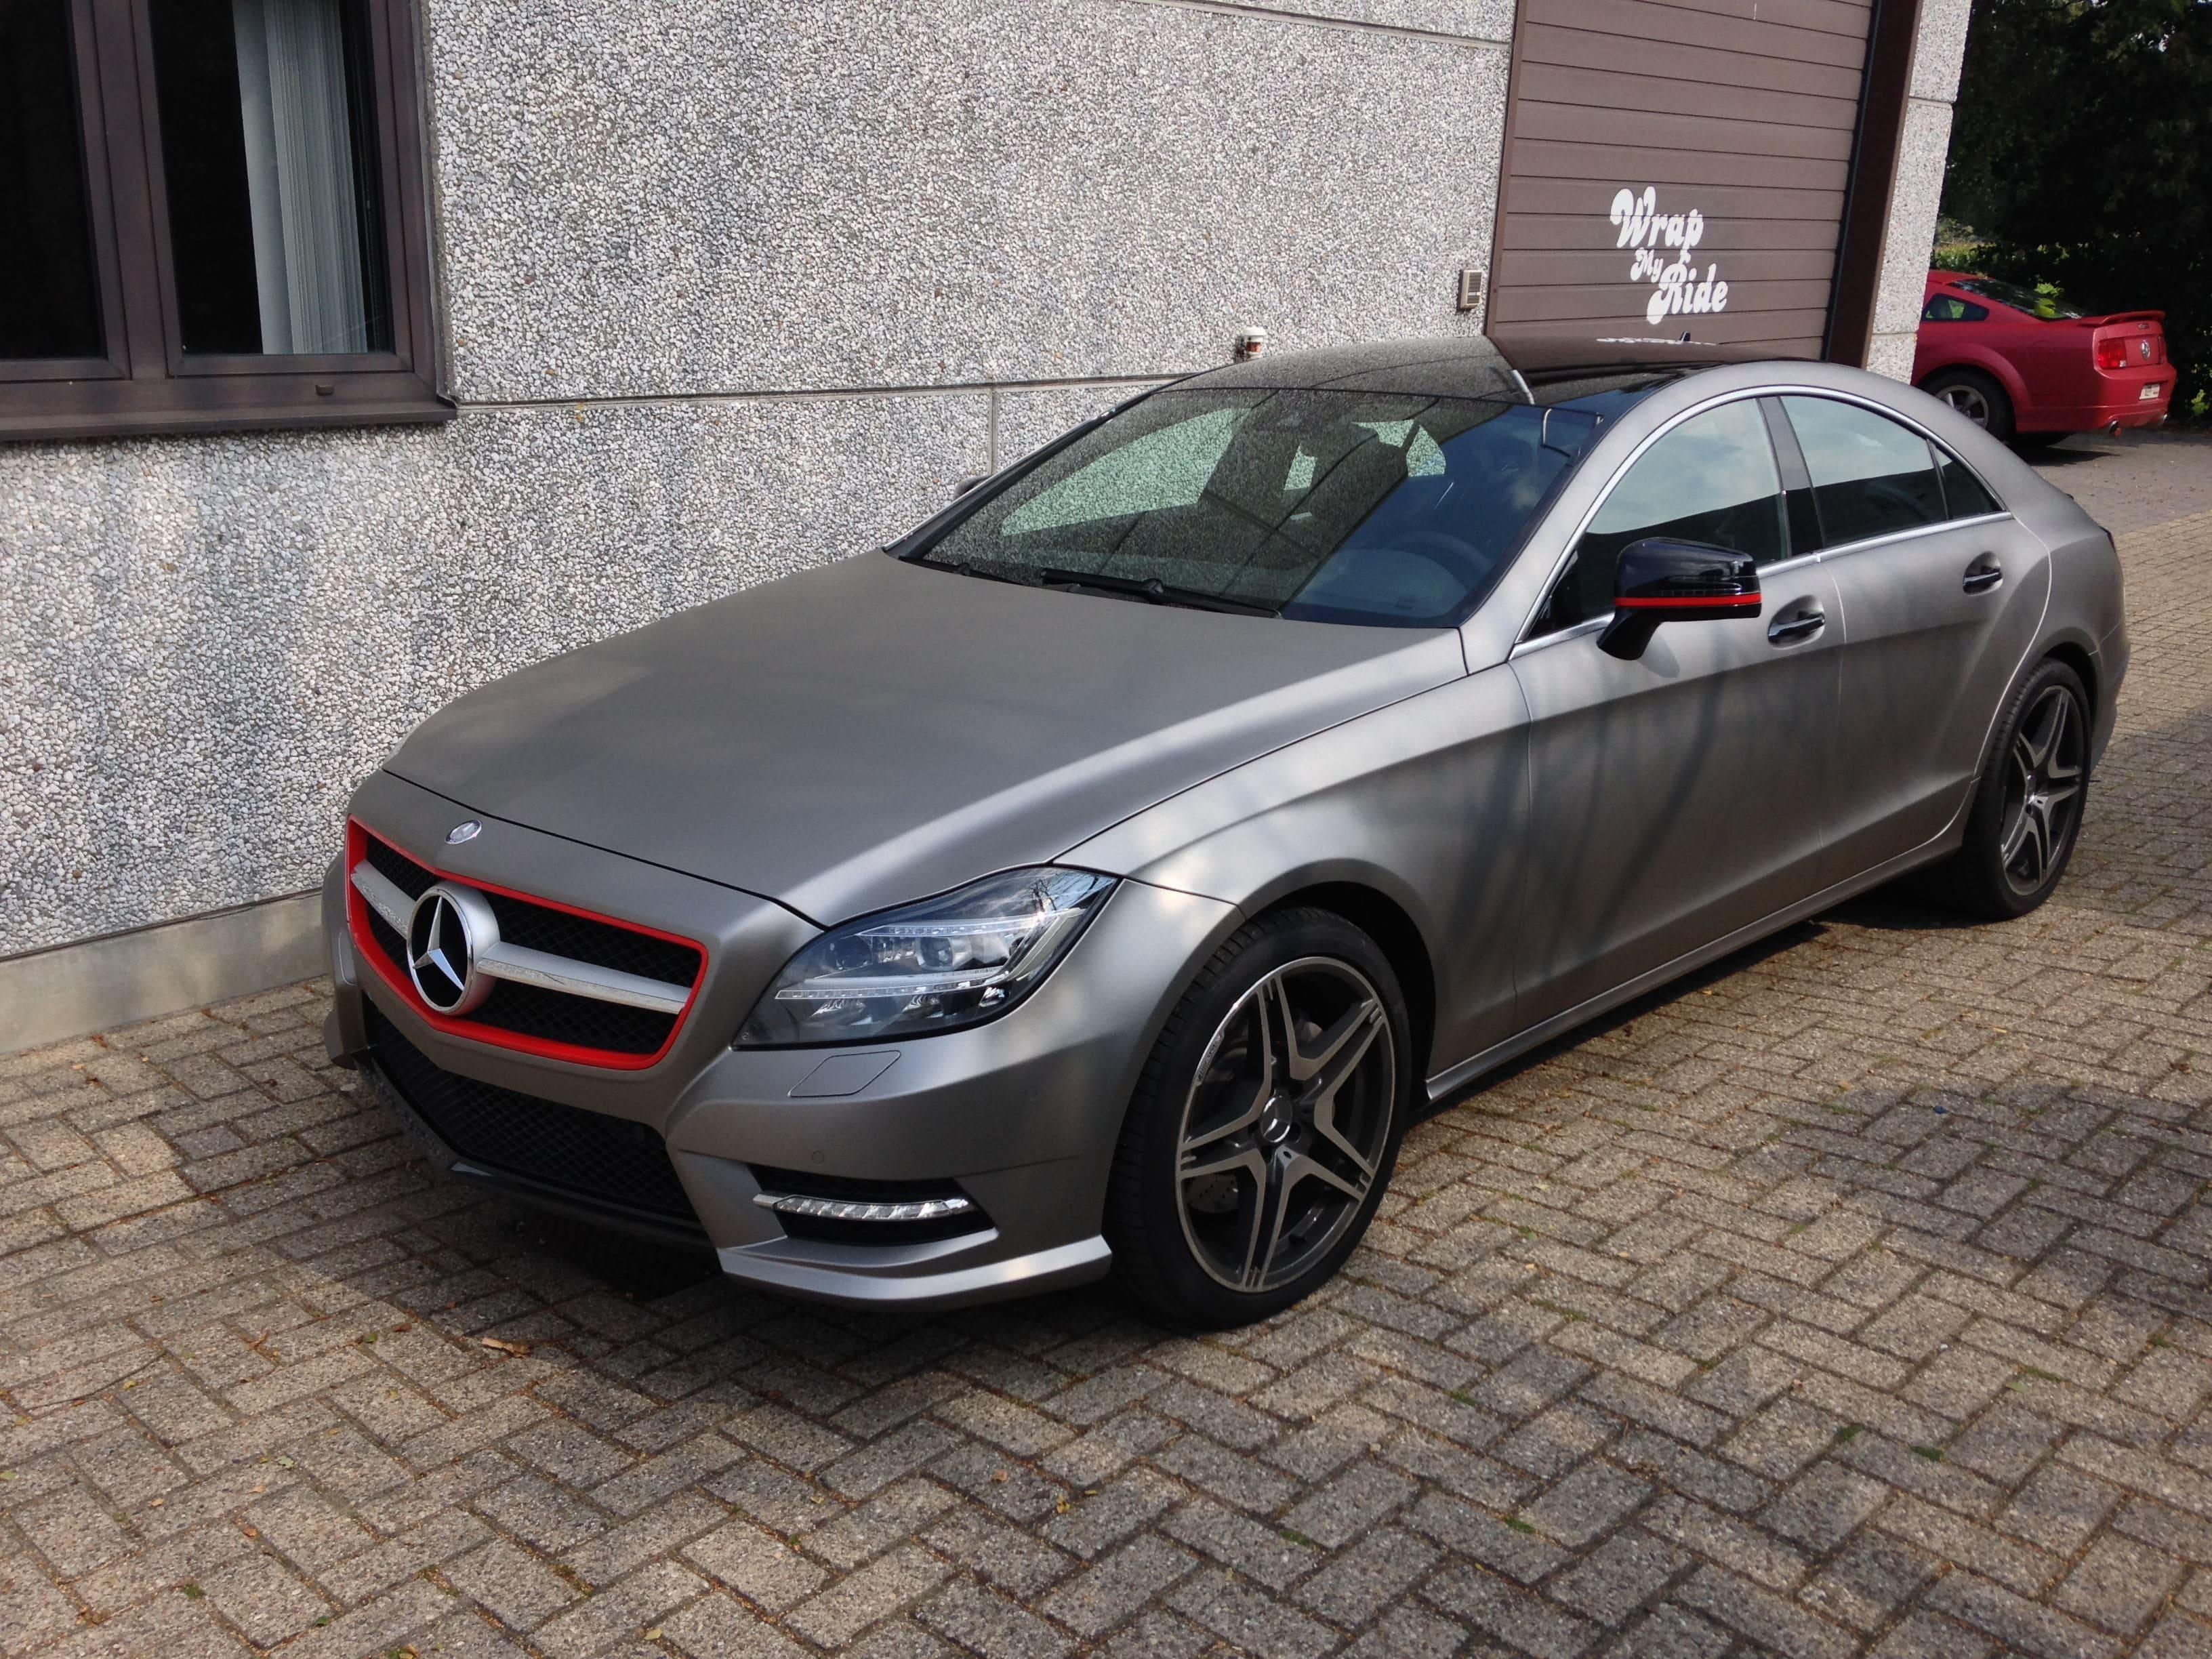 Mercedes CLS met Mat Grey Aluminium Wrap, Carwrapping door Wrapmyride.nu Foto-nr:6139, ©2020